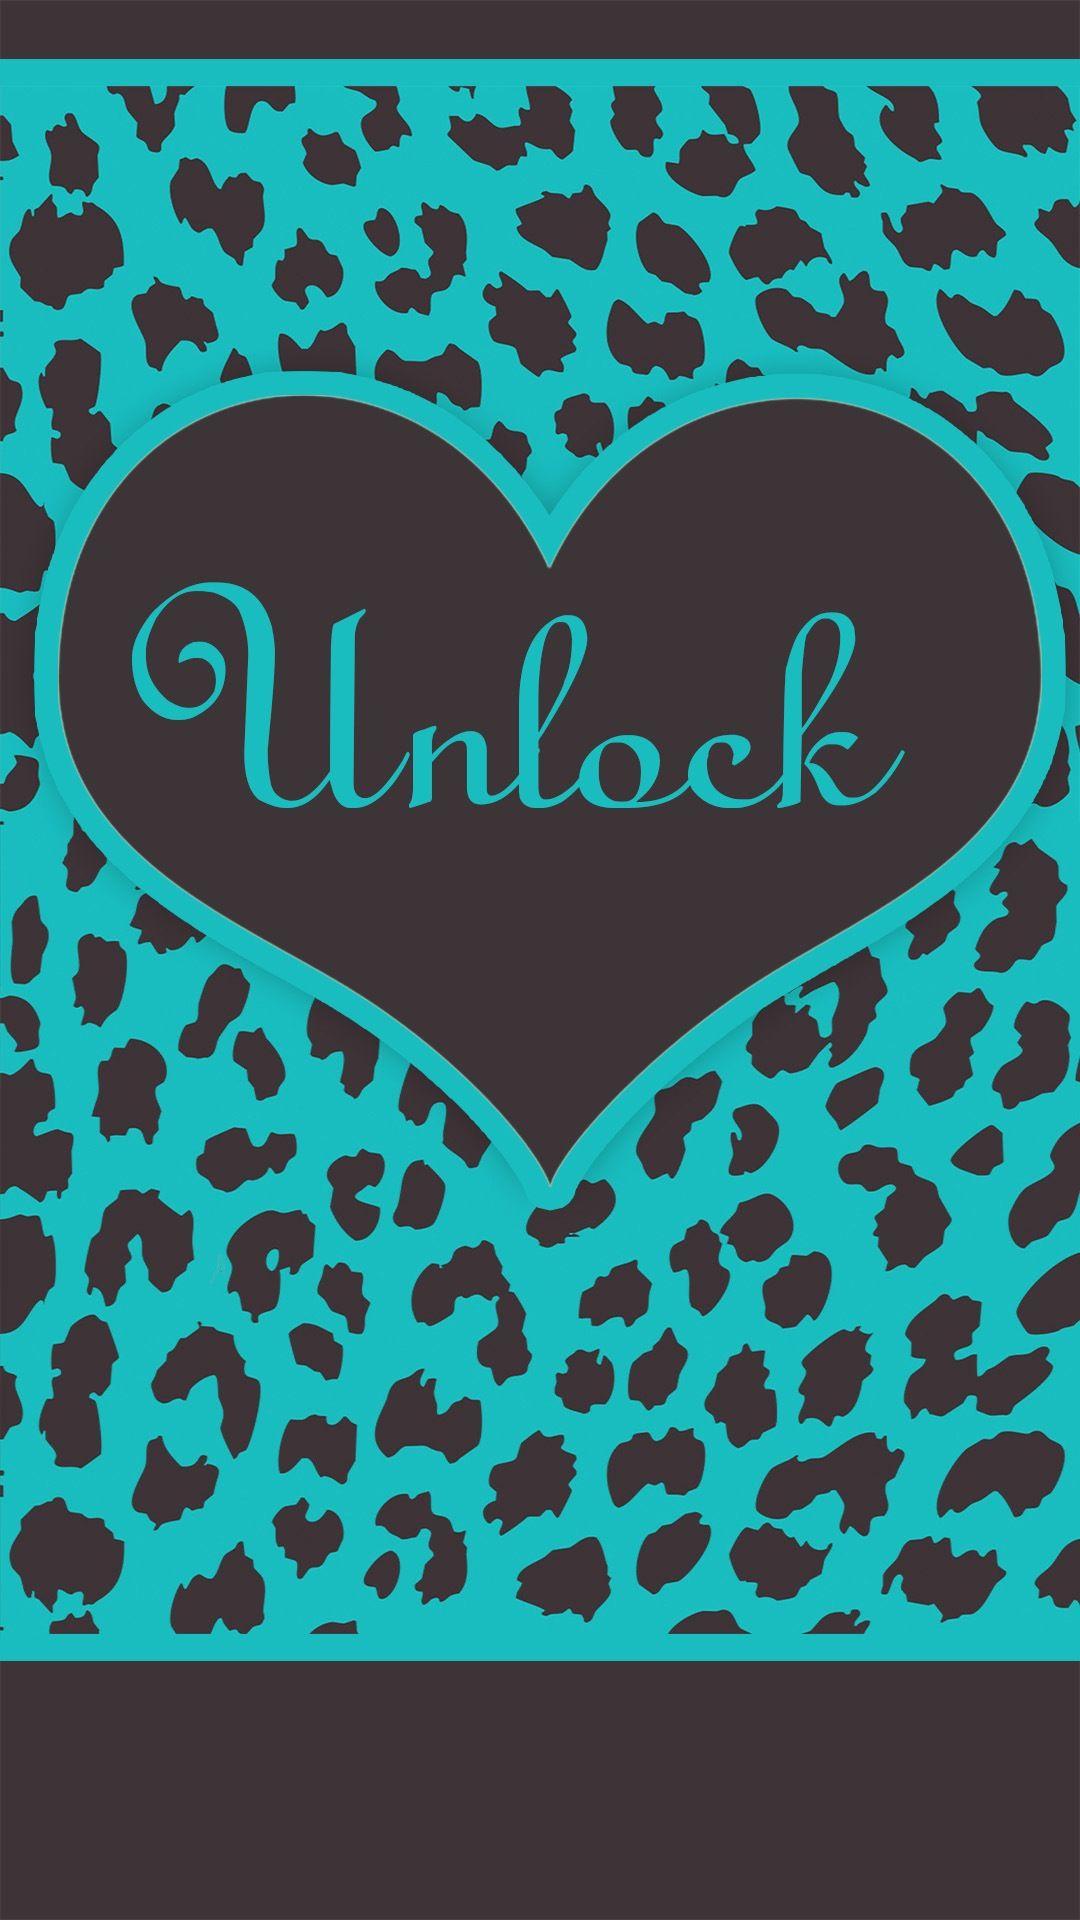 girly iphone lock screen wallpaper A86 Wallpaper ponsel